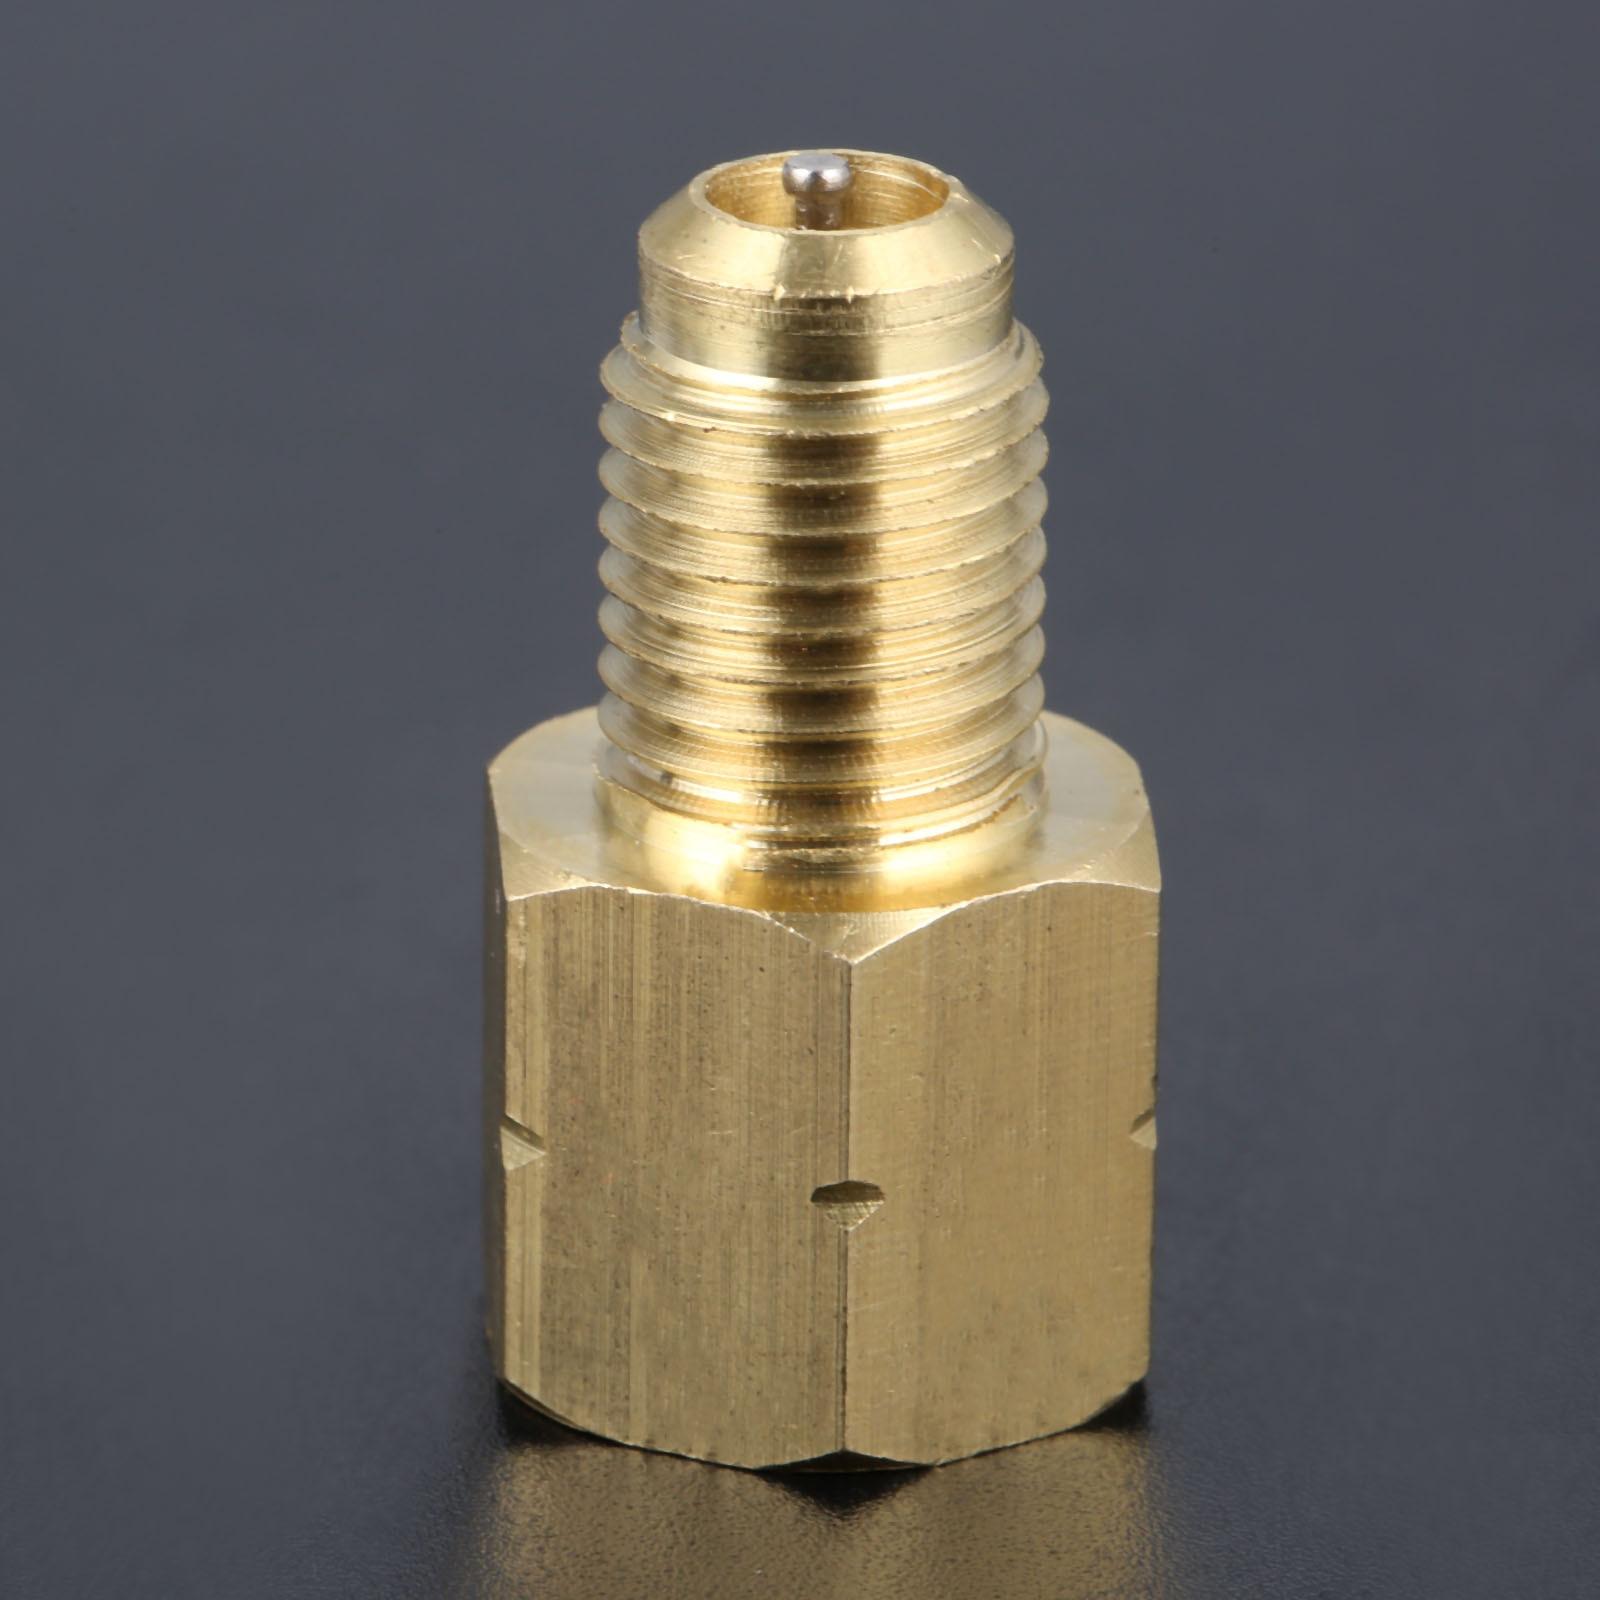 R1234YF Vacuum Pump Adapter Refrigerant Tank to R12 Fitting 1/2 Female Acme 1/4 Male Flare Adaptor